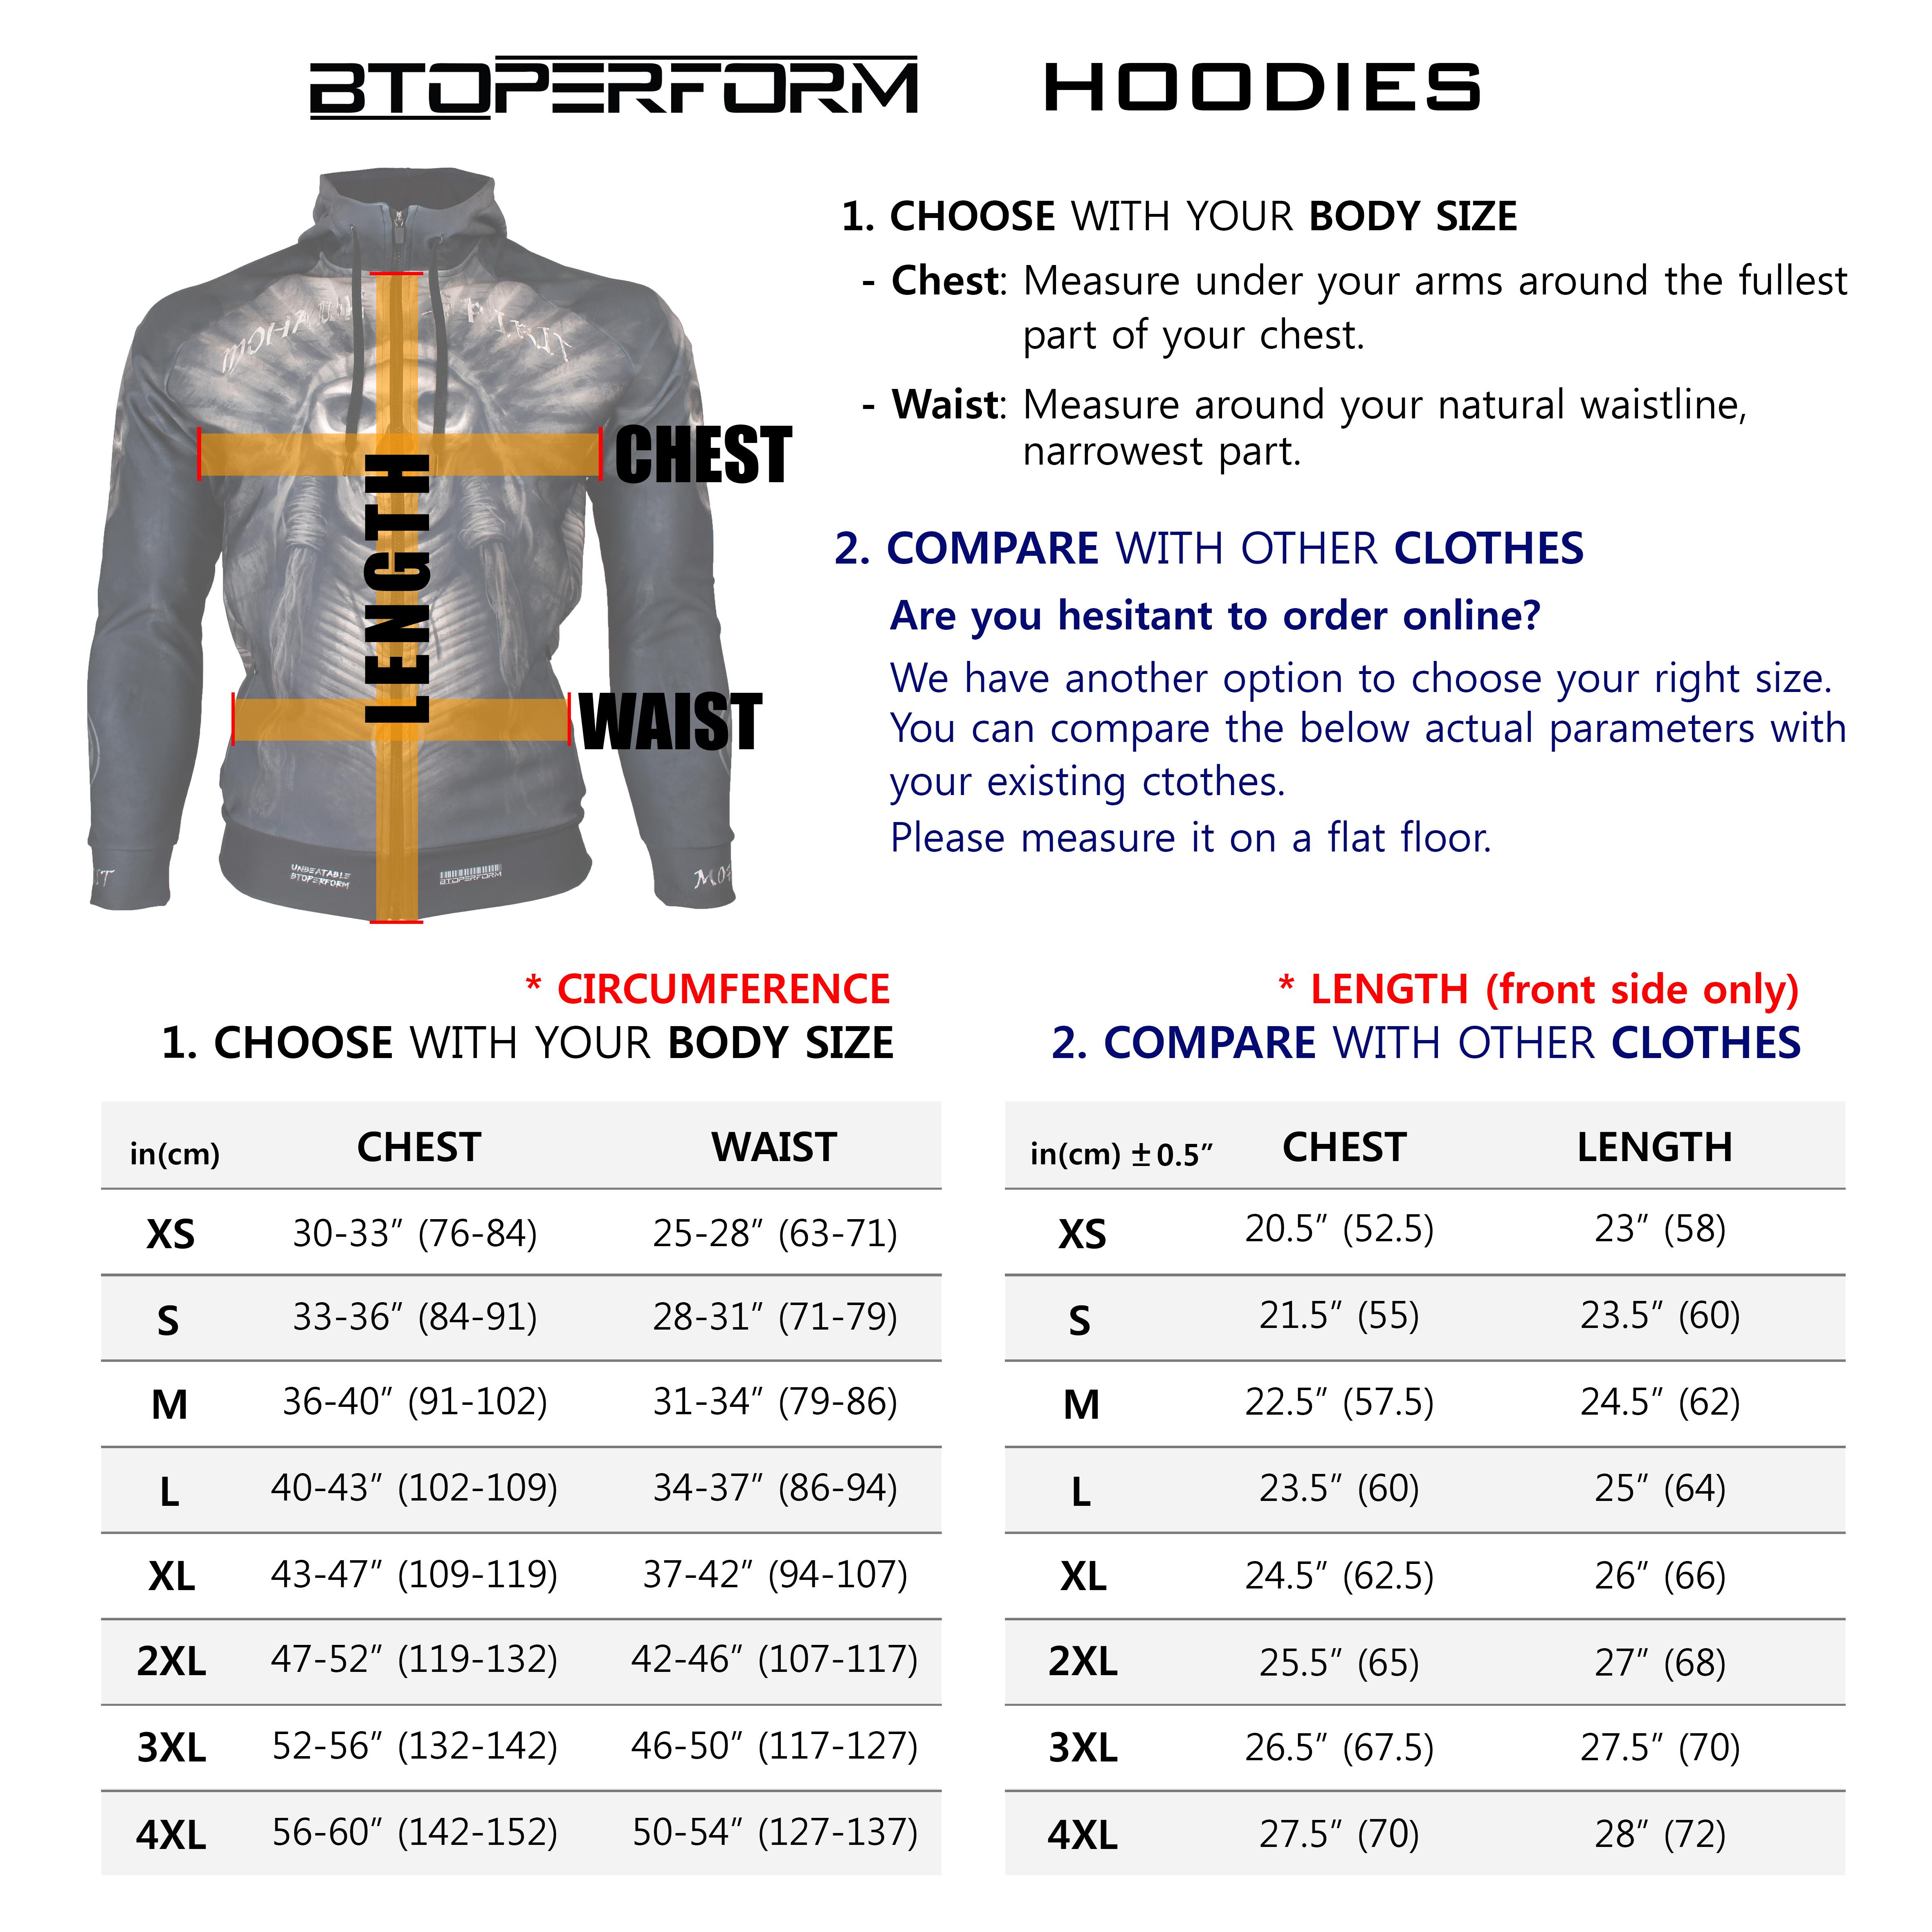 btoperform-size-chart-mens-hoodies.jpg